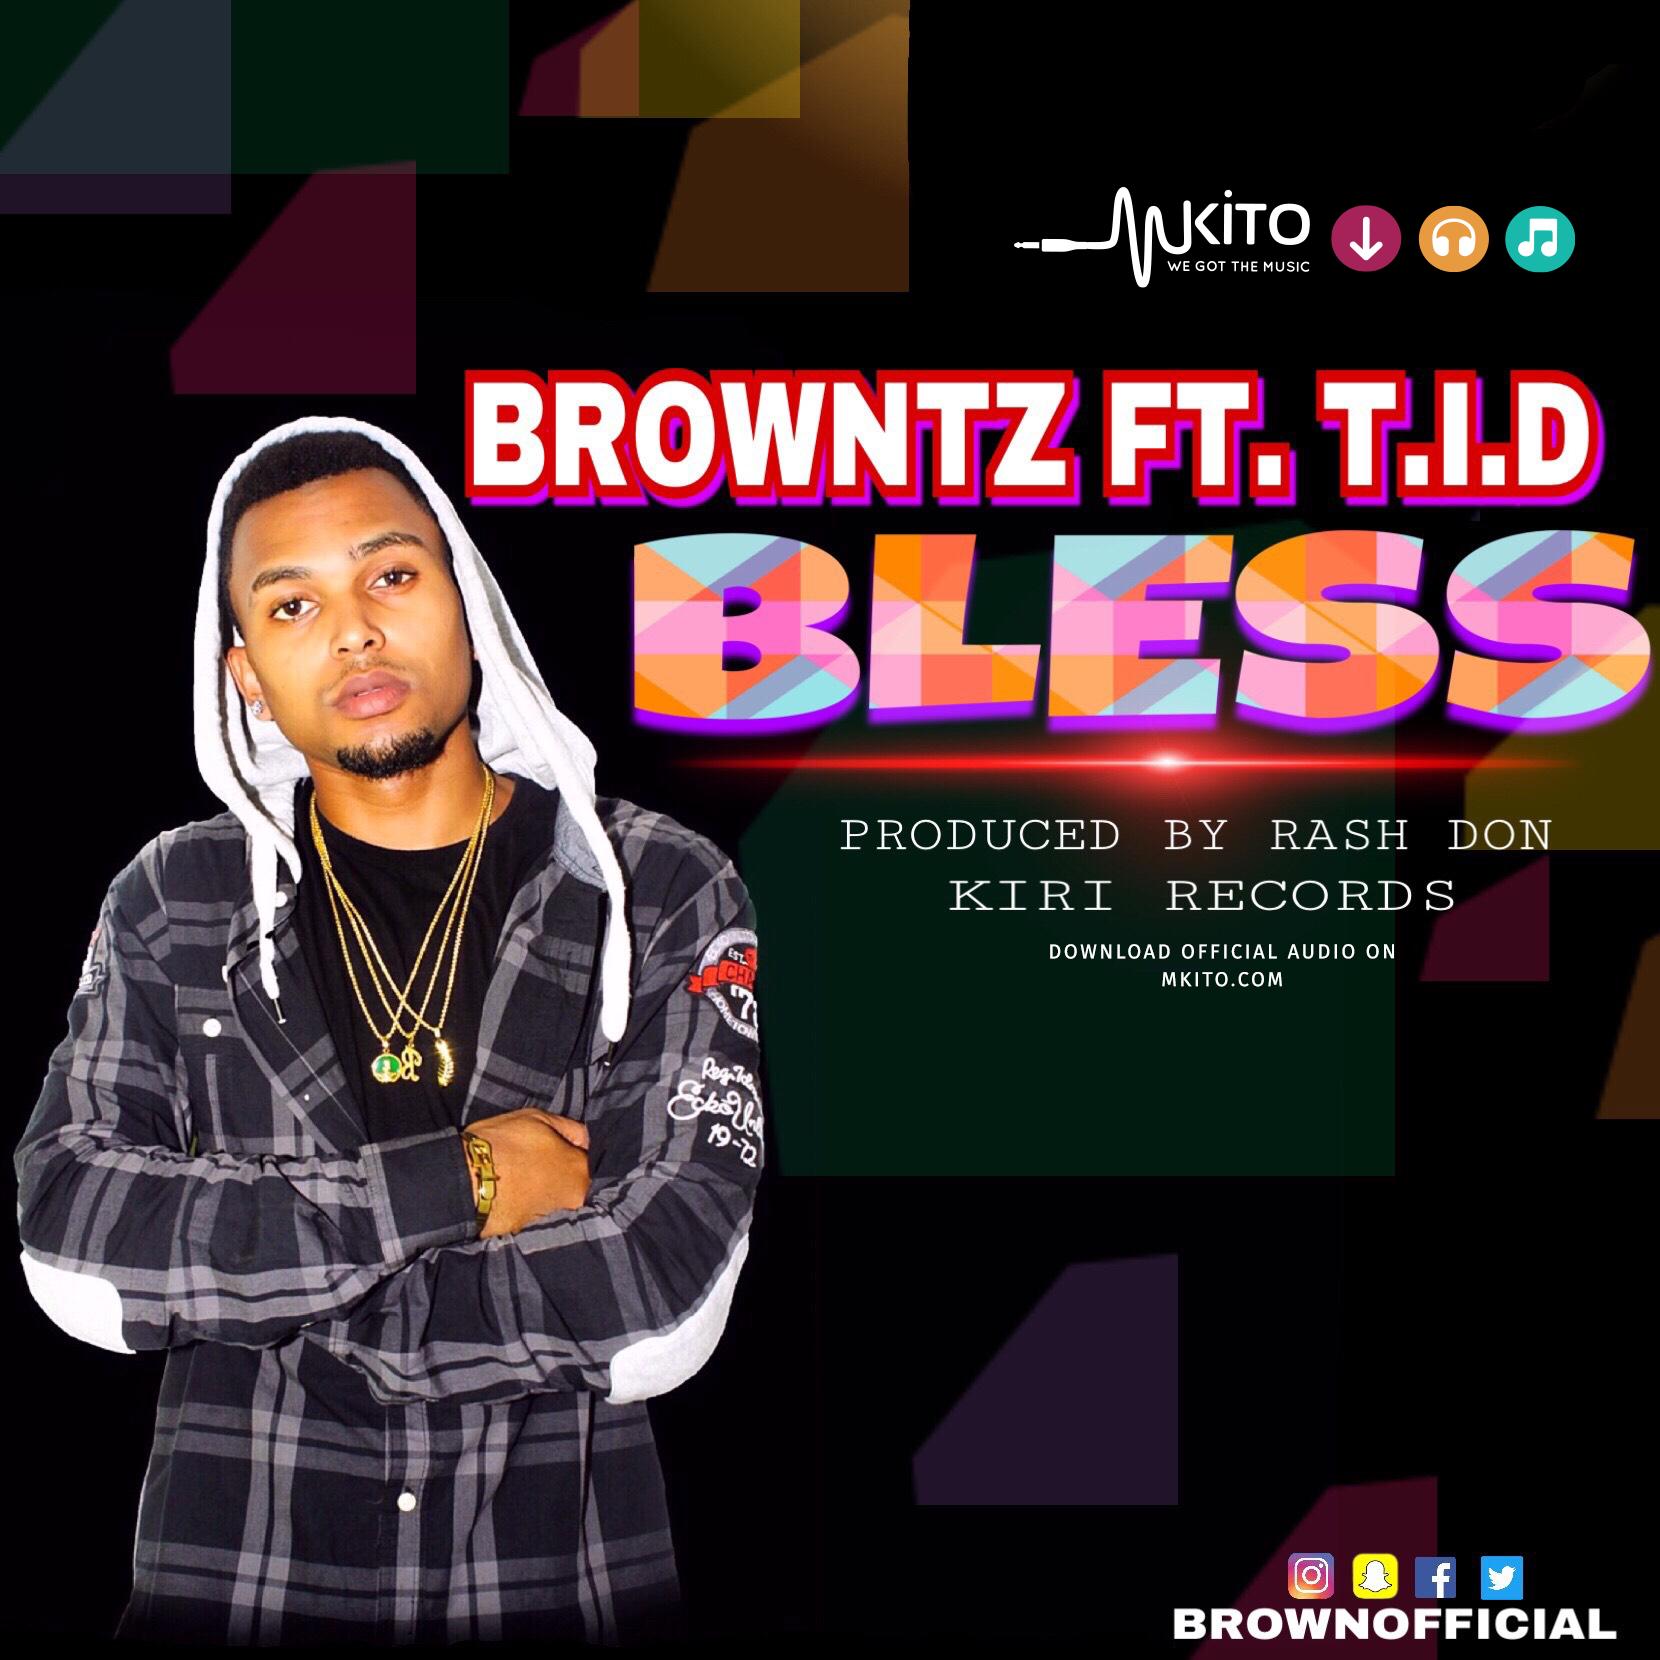 Brown - BROWNTZ FT. T.I.D - BLESS